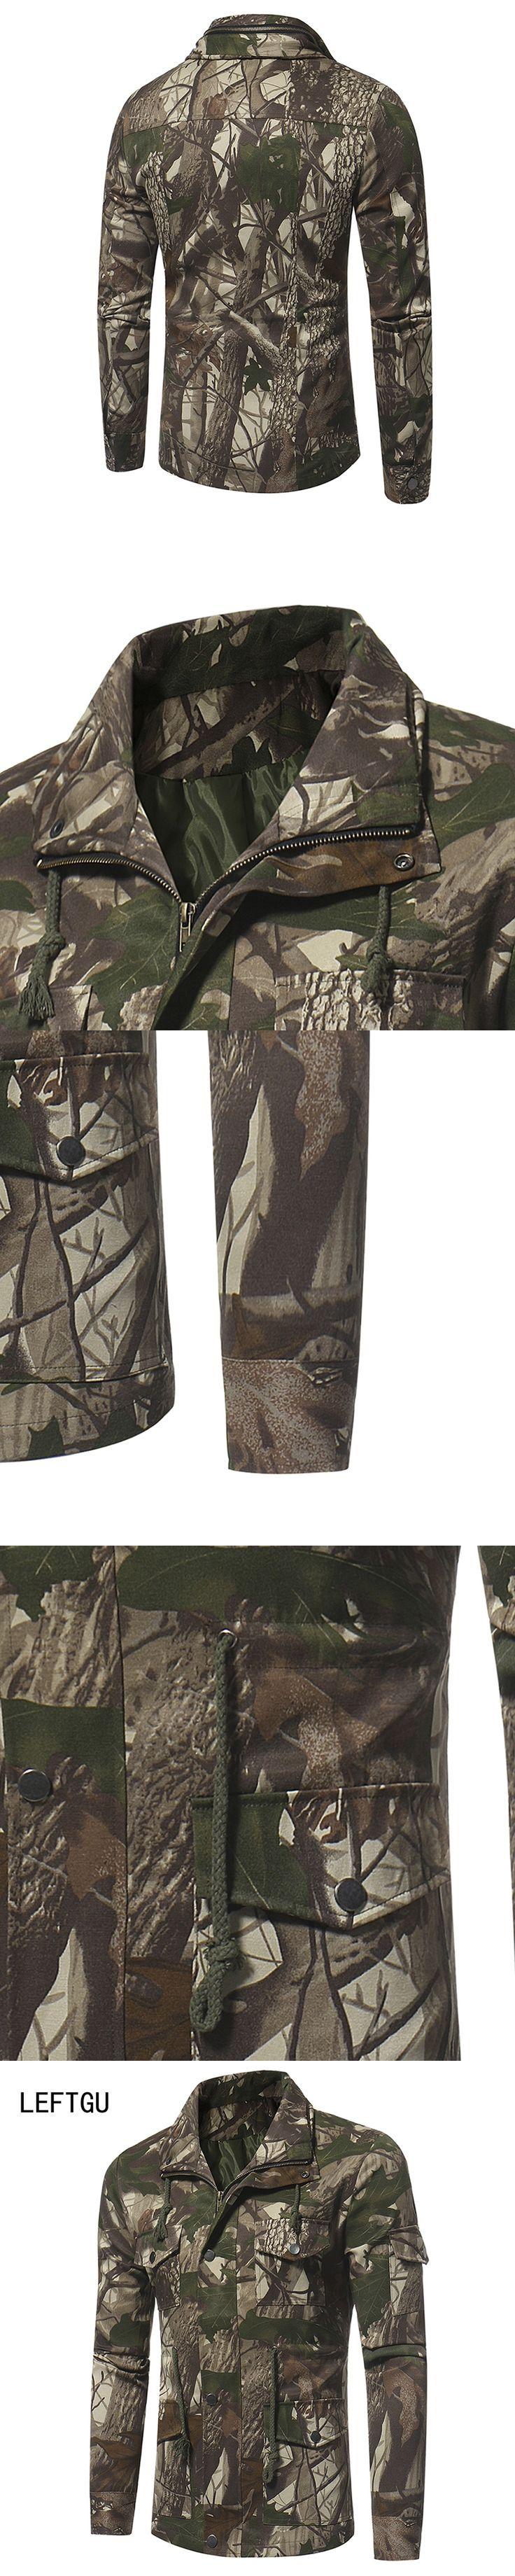 LEFTGU 2017 Autumn Jacket men jungle camouflage coat Outdoors military style Clothes JK8S